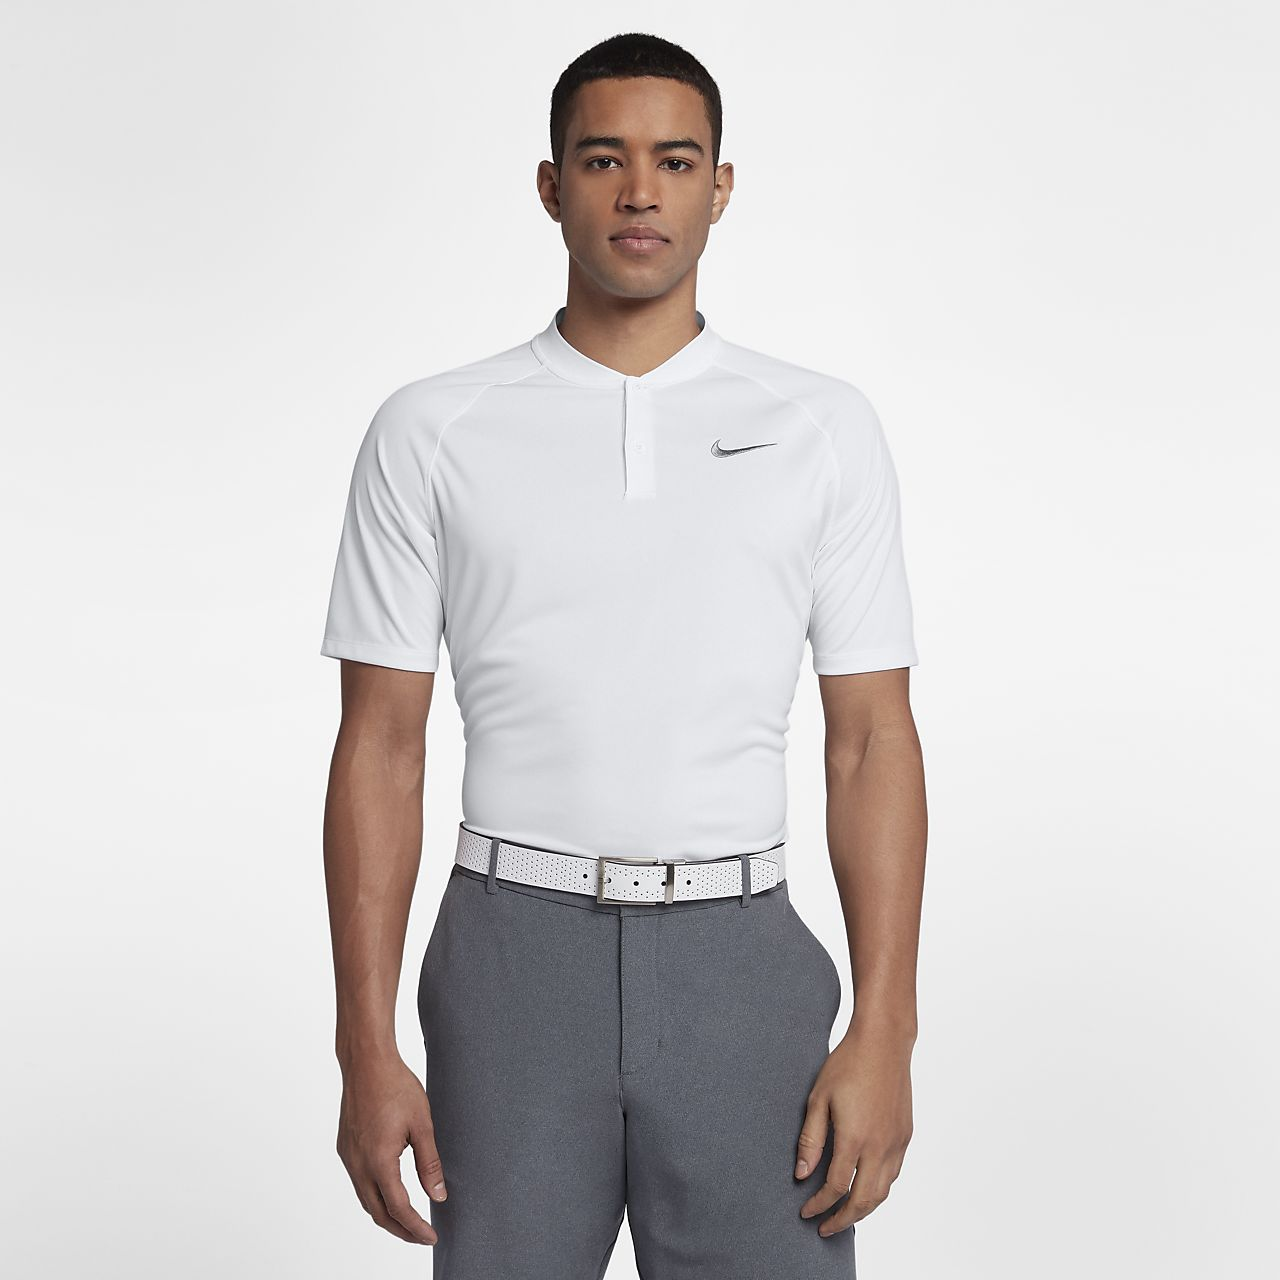 ... Nike Dri-FIT Momentum Men's Standard Fit Golf Polo